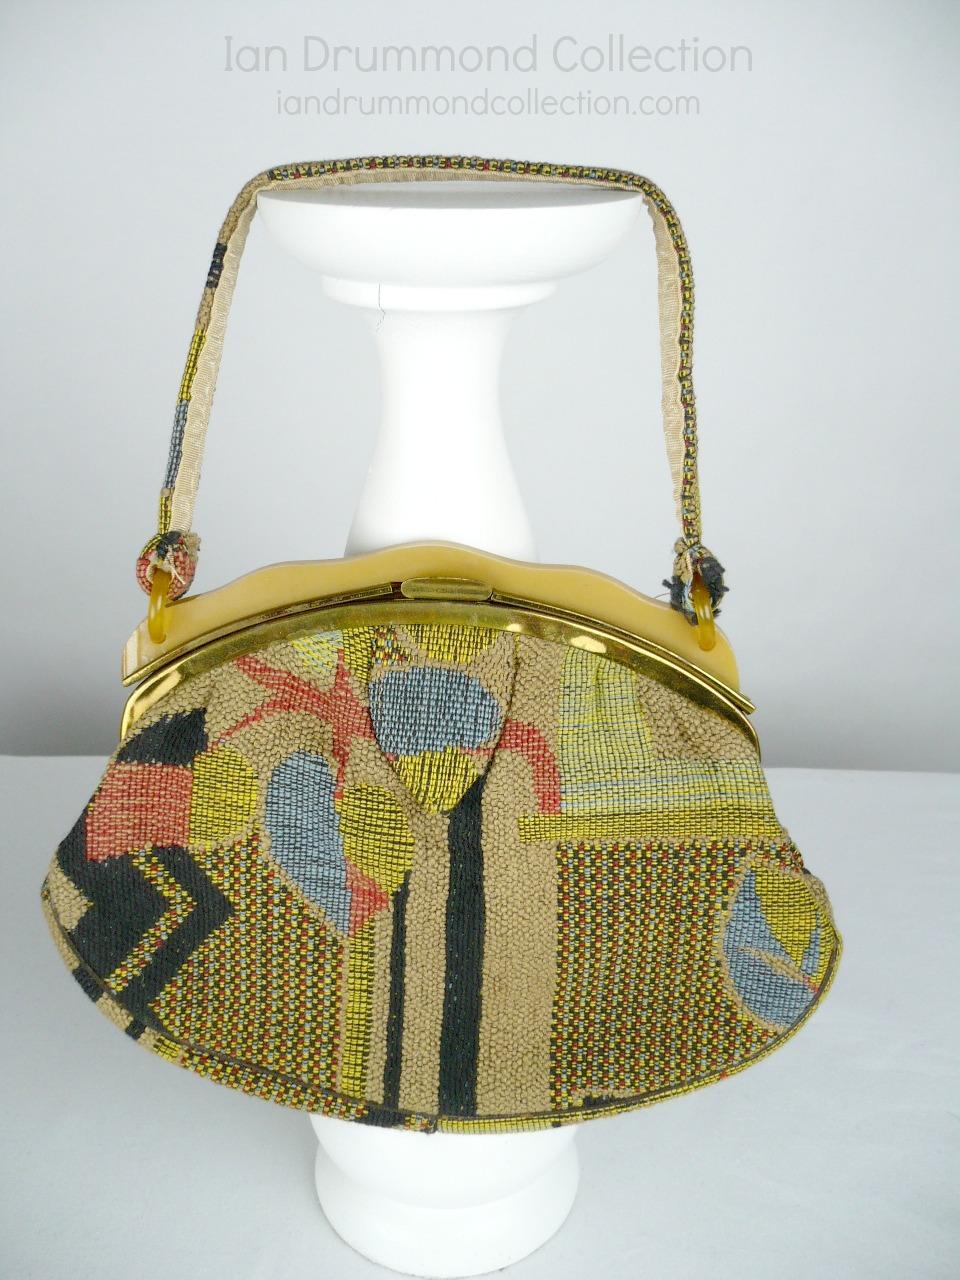 Ian Drummond Collection TV Movie Vintage Clothing Wardrobe Rental Toronto 1930s purse 7 (1)